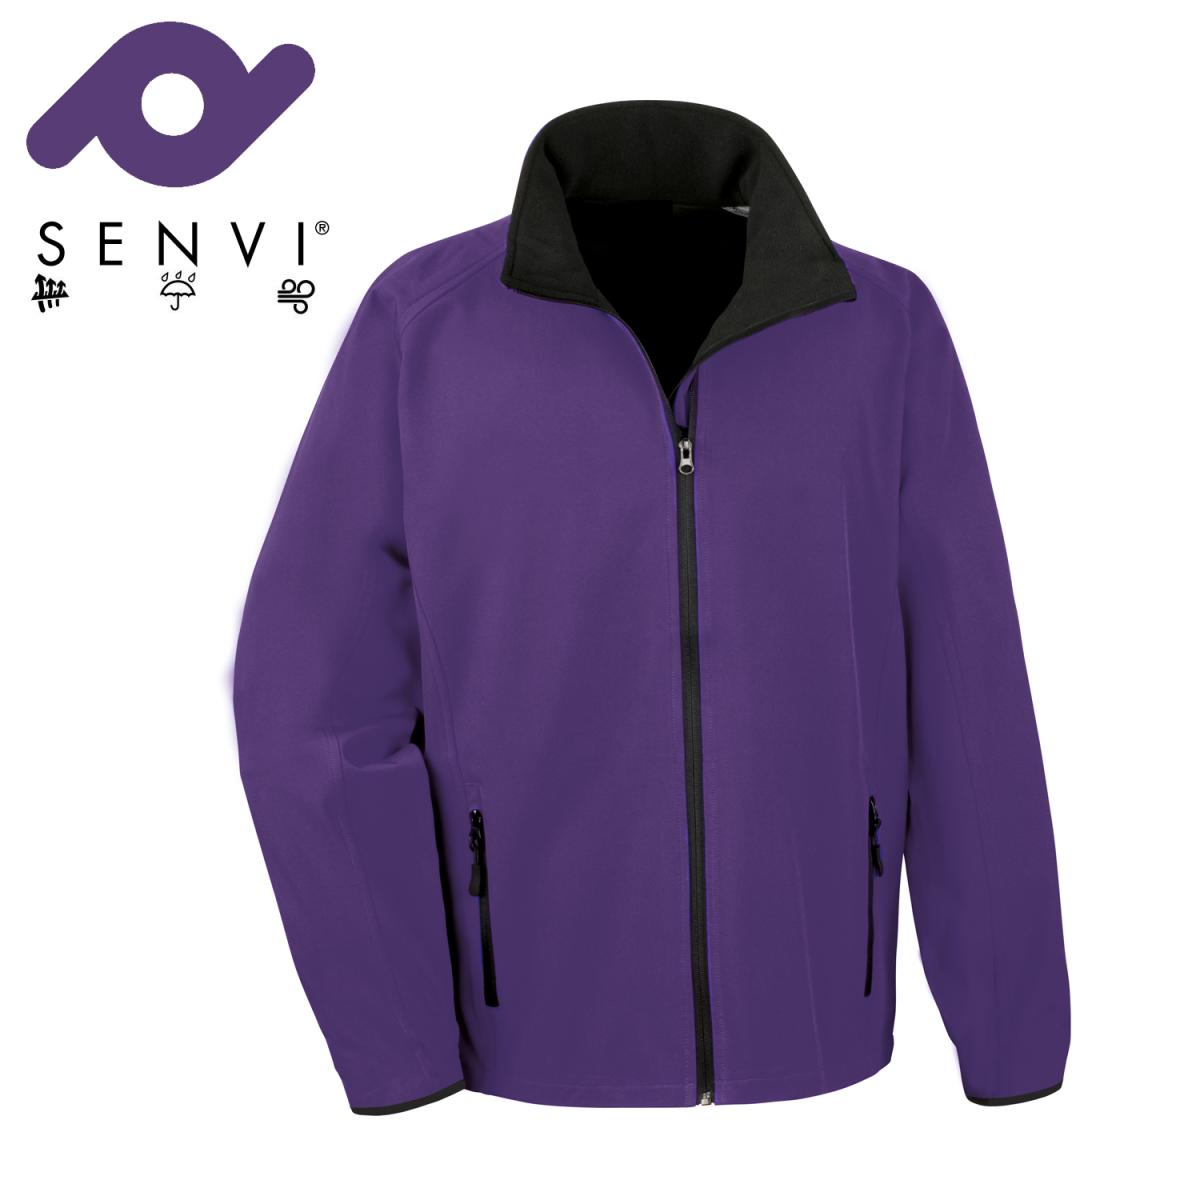 Senvi Softshell Jas - Kleur Paars//Zwart- Maat XXXXL (4XL)